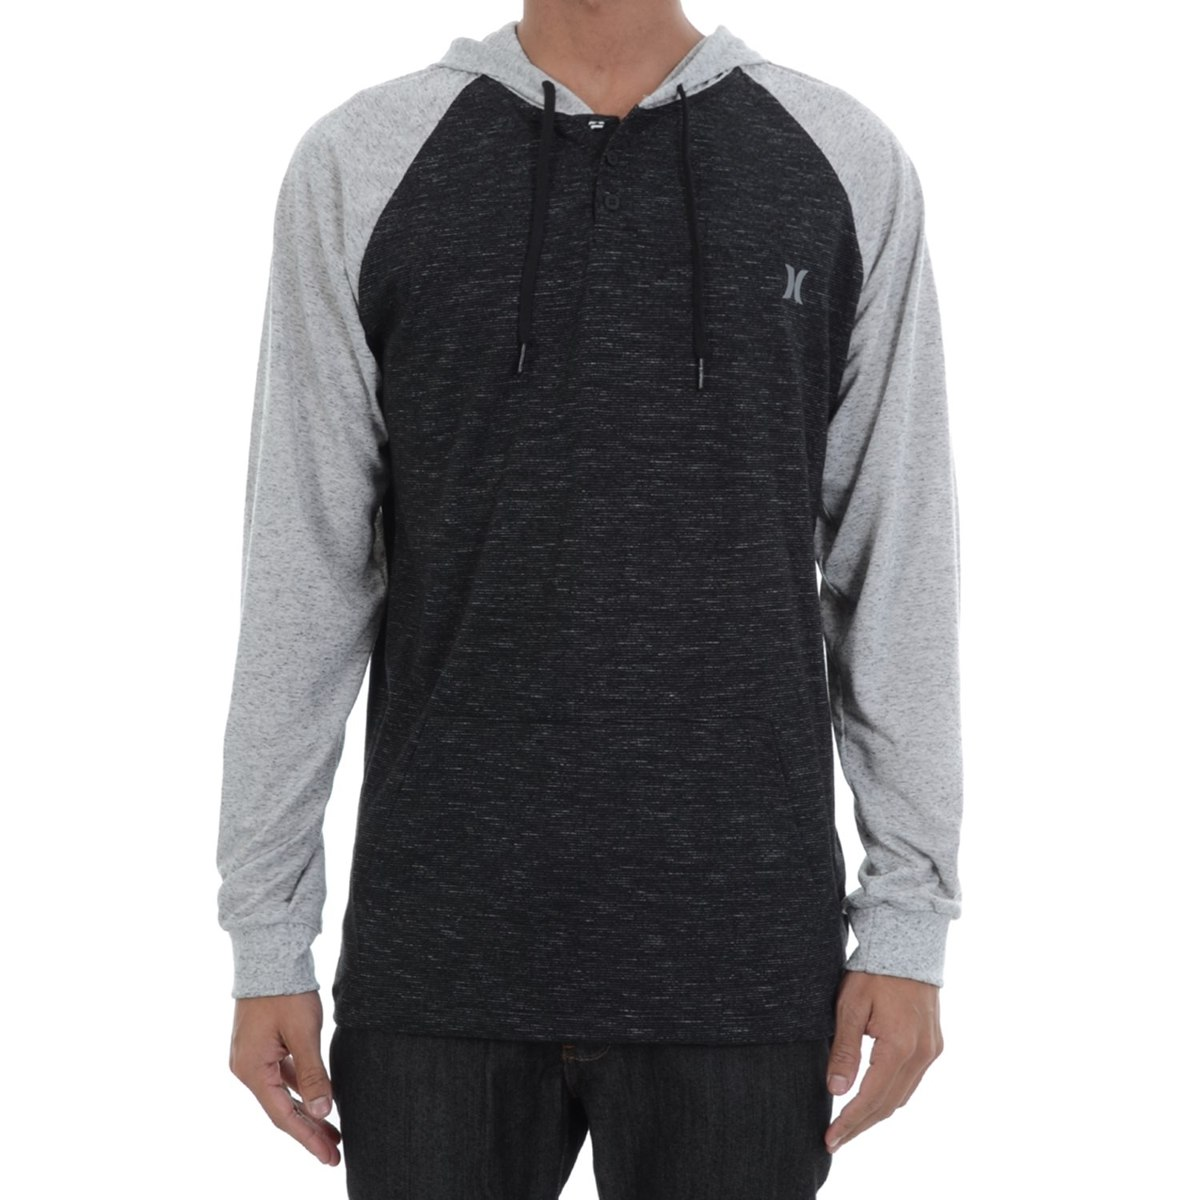 52fee1cc26c53 camiseta hurley manga longa raglan sublimada preta. Carregando zoom.